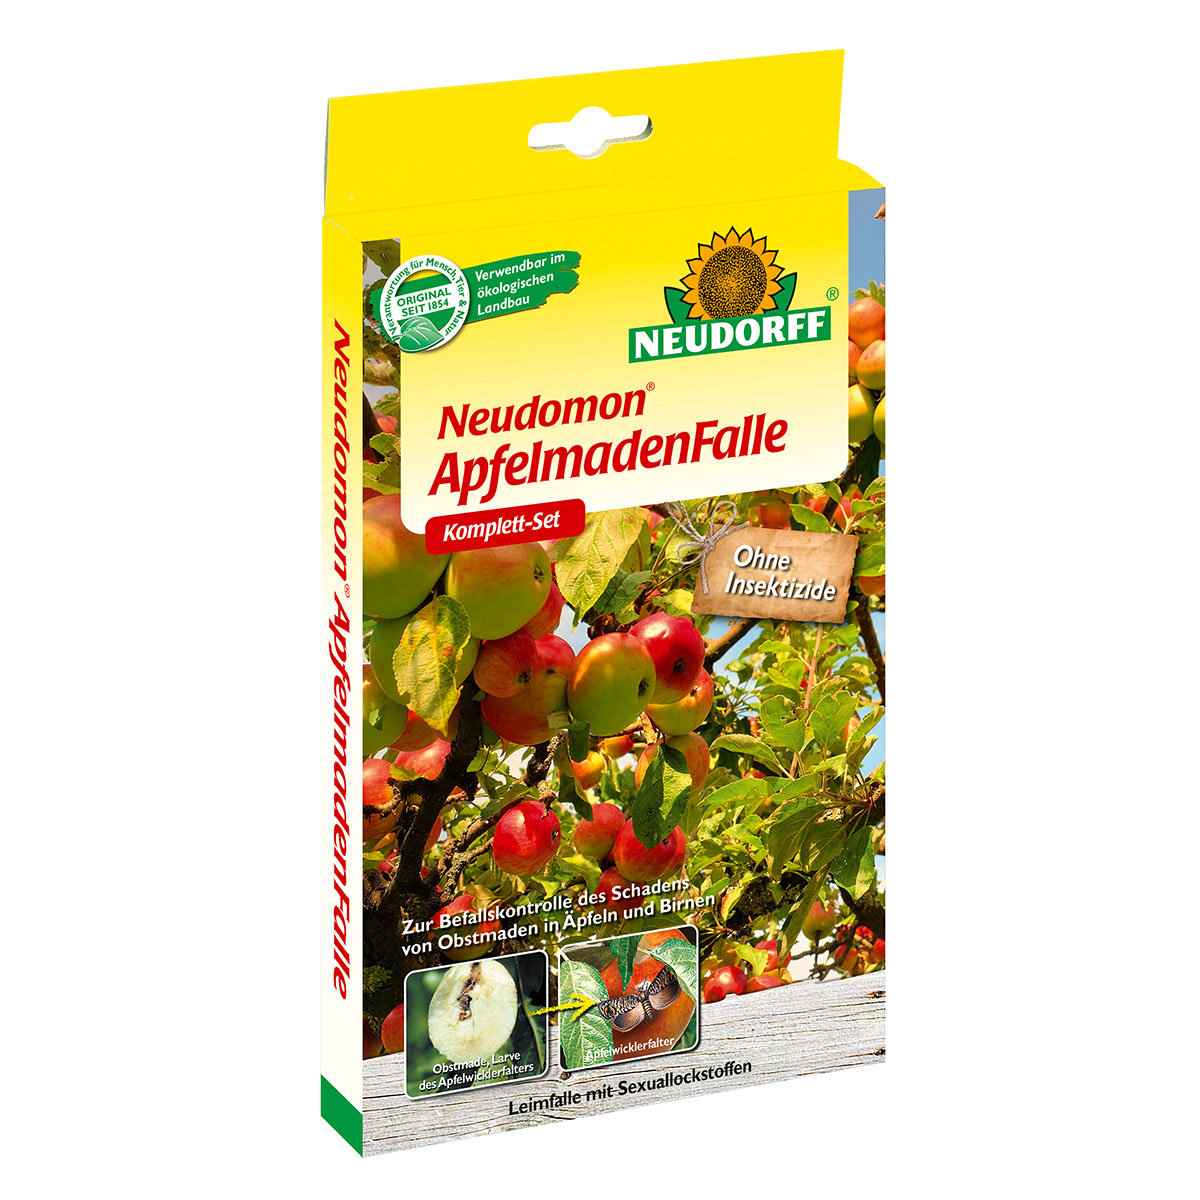 Apfelmaden-Falle, 1 Komplett-Set